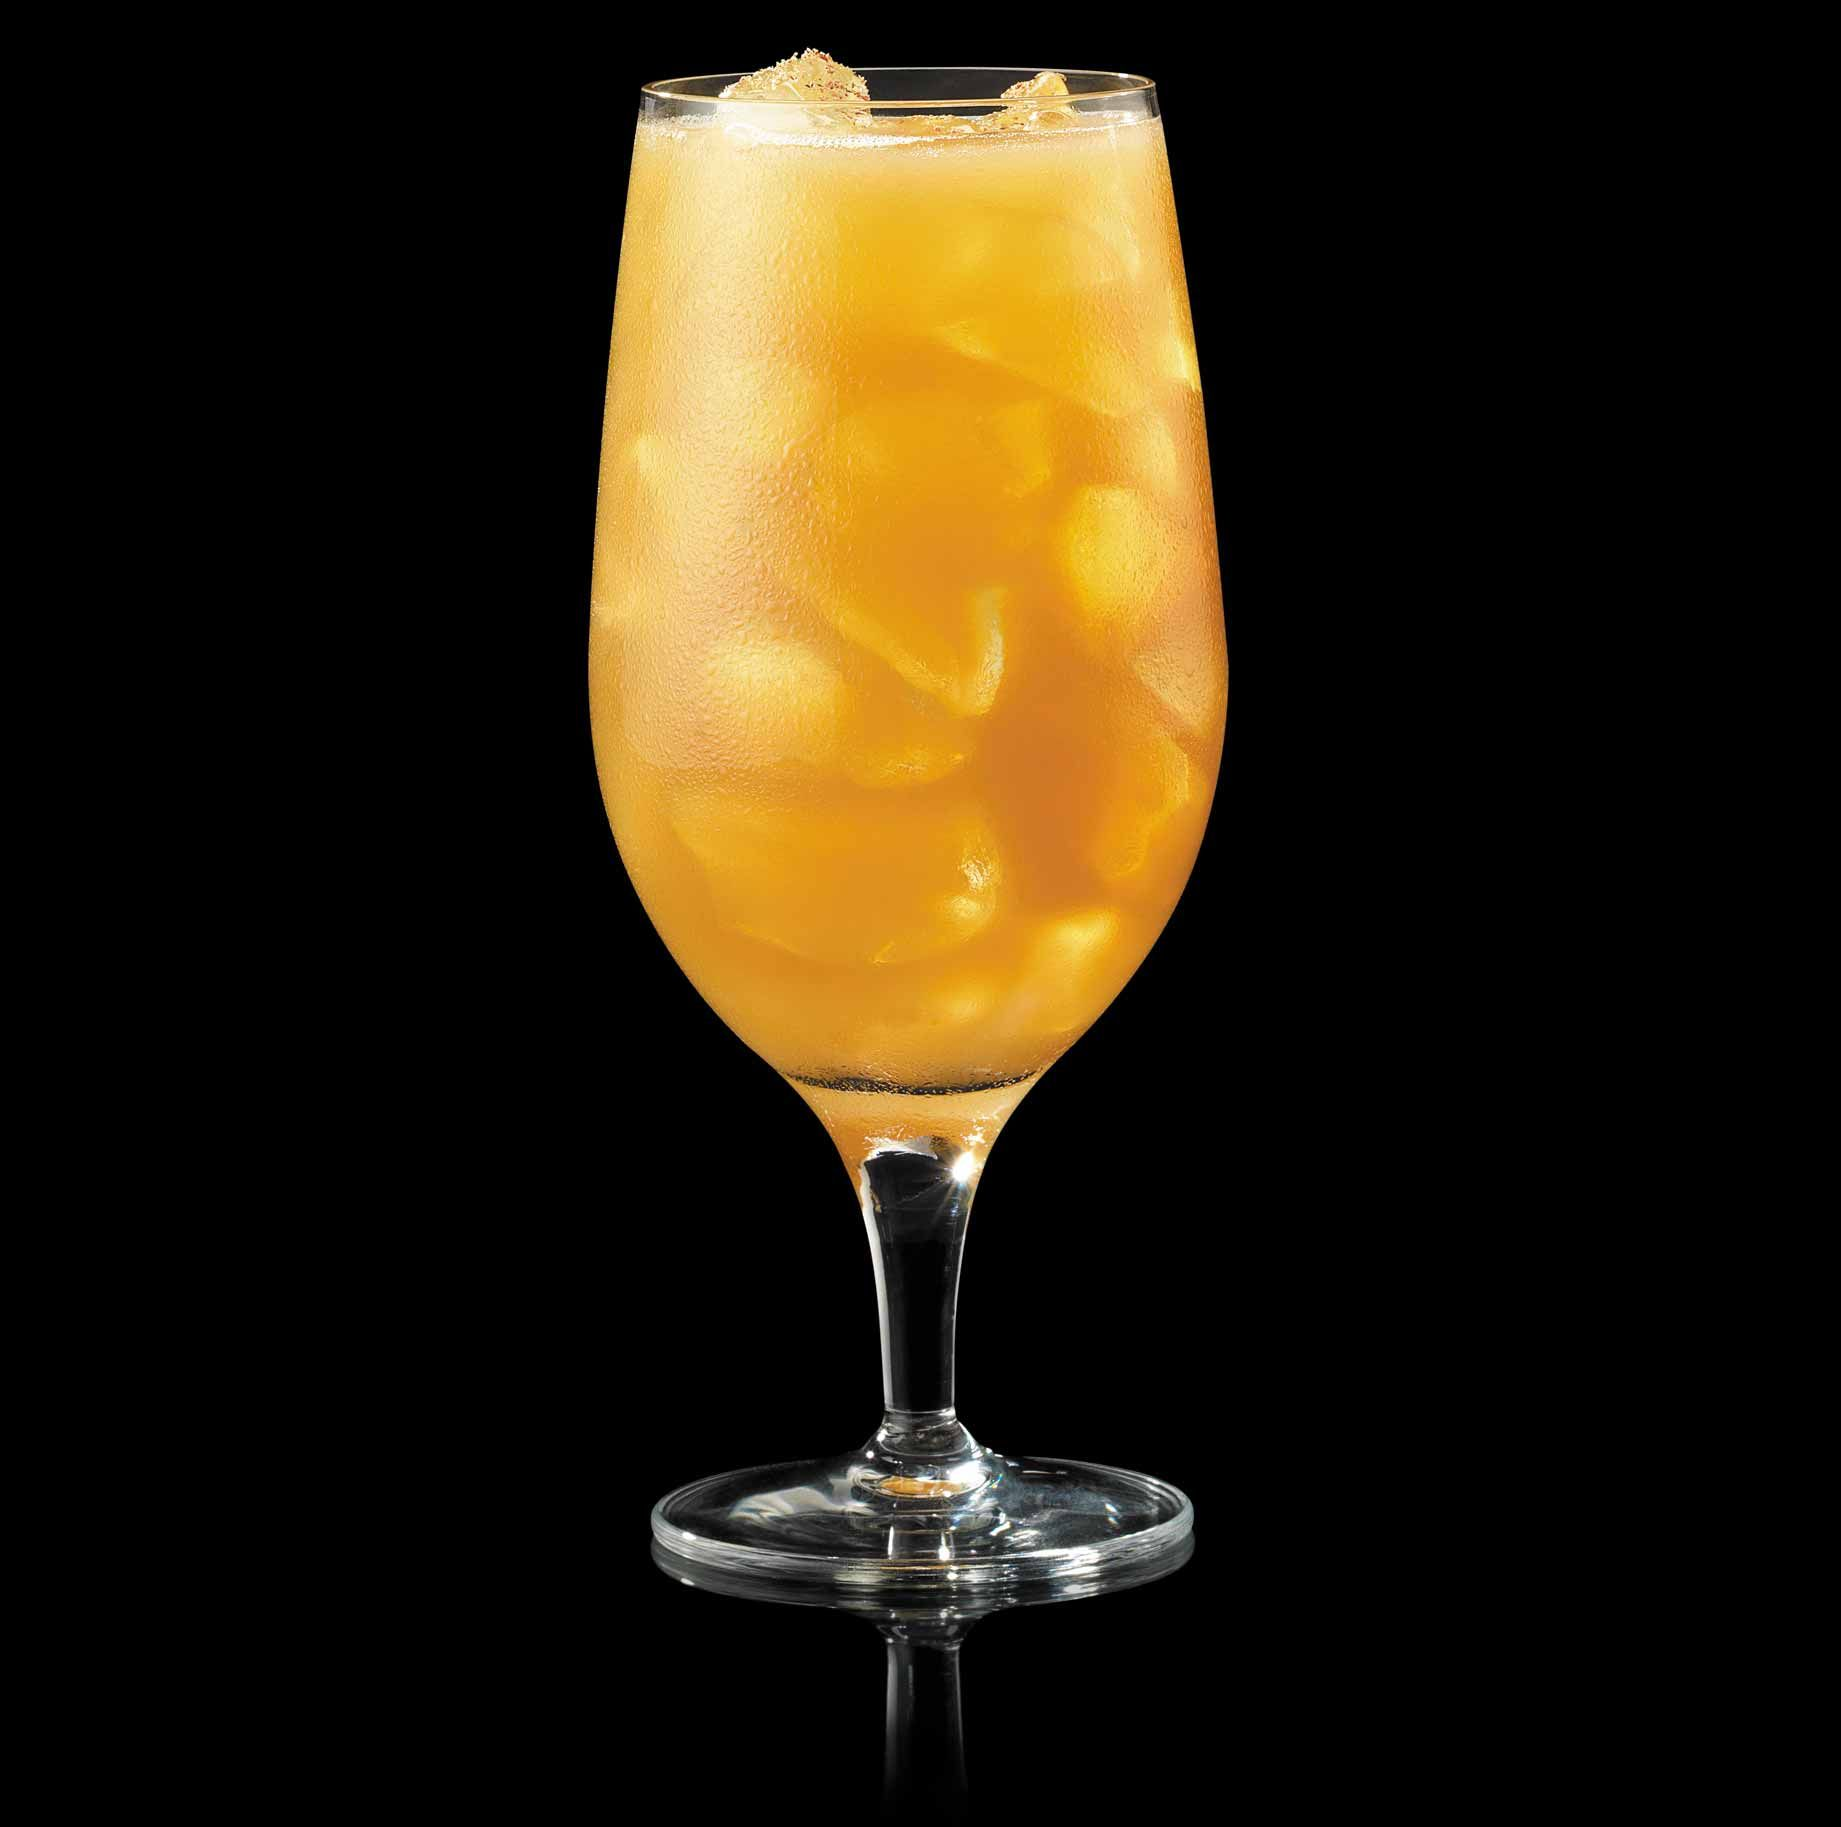 Bardstown sling makers mark peach brandy peach puree